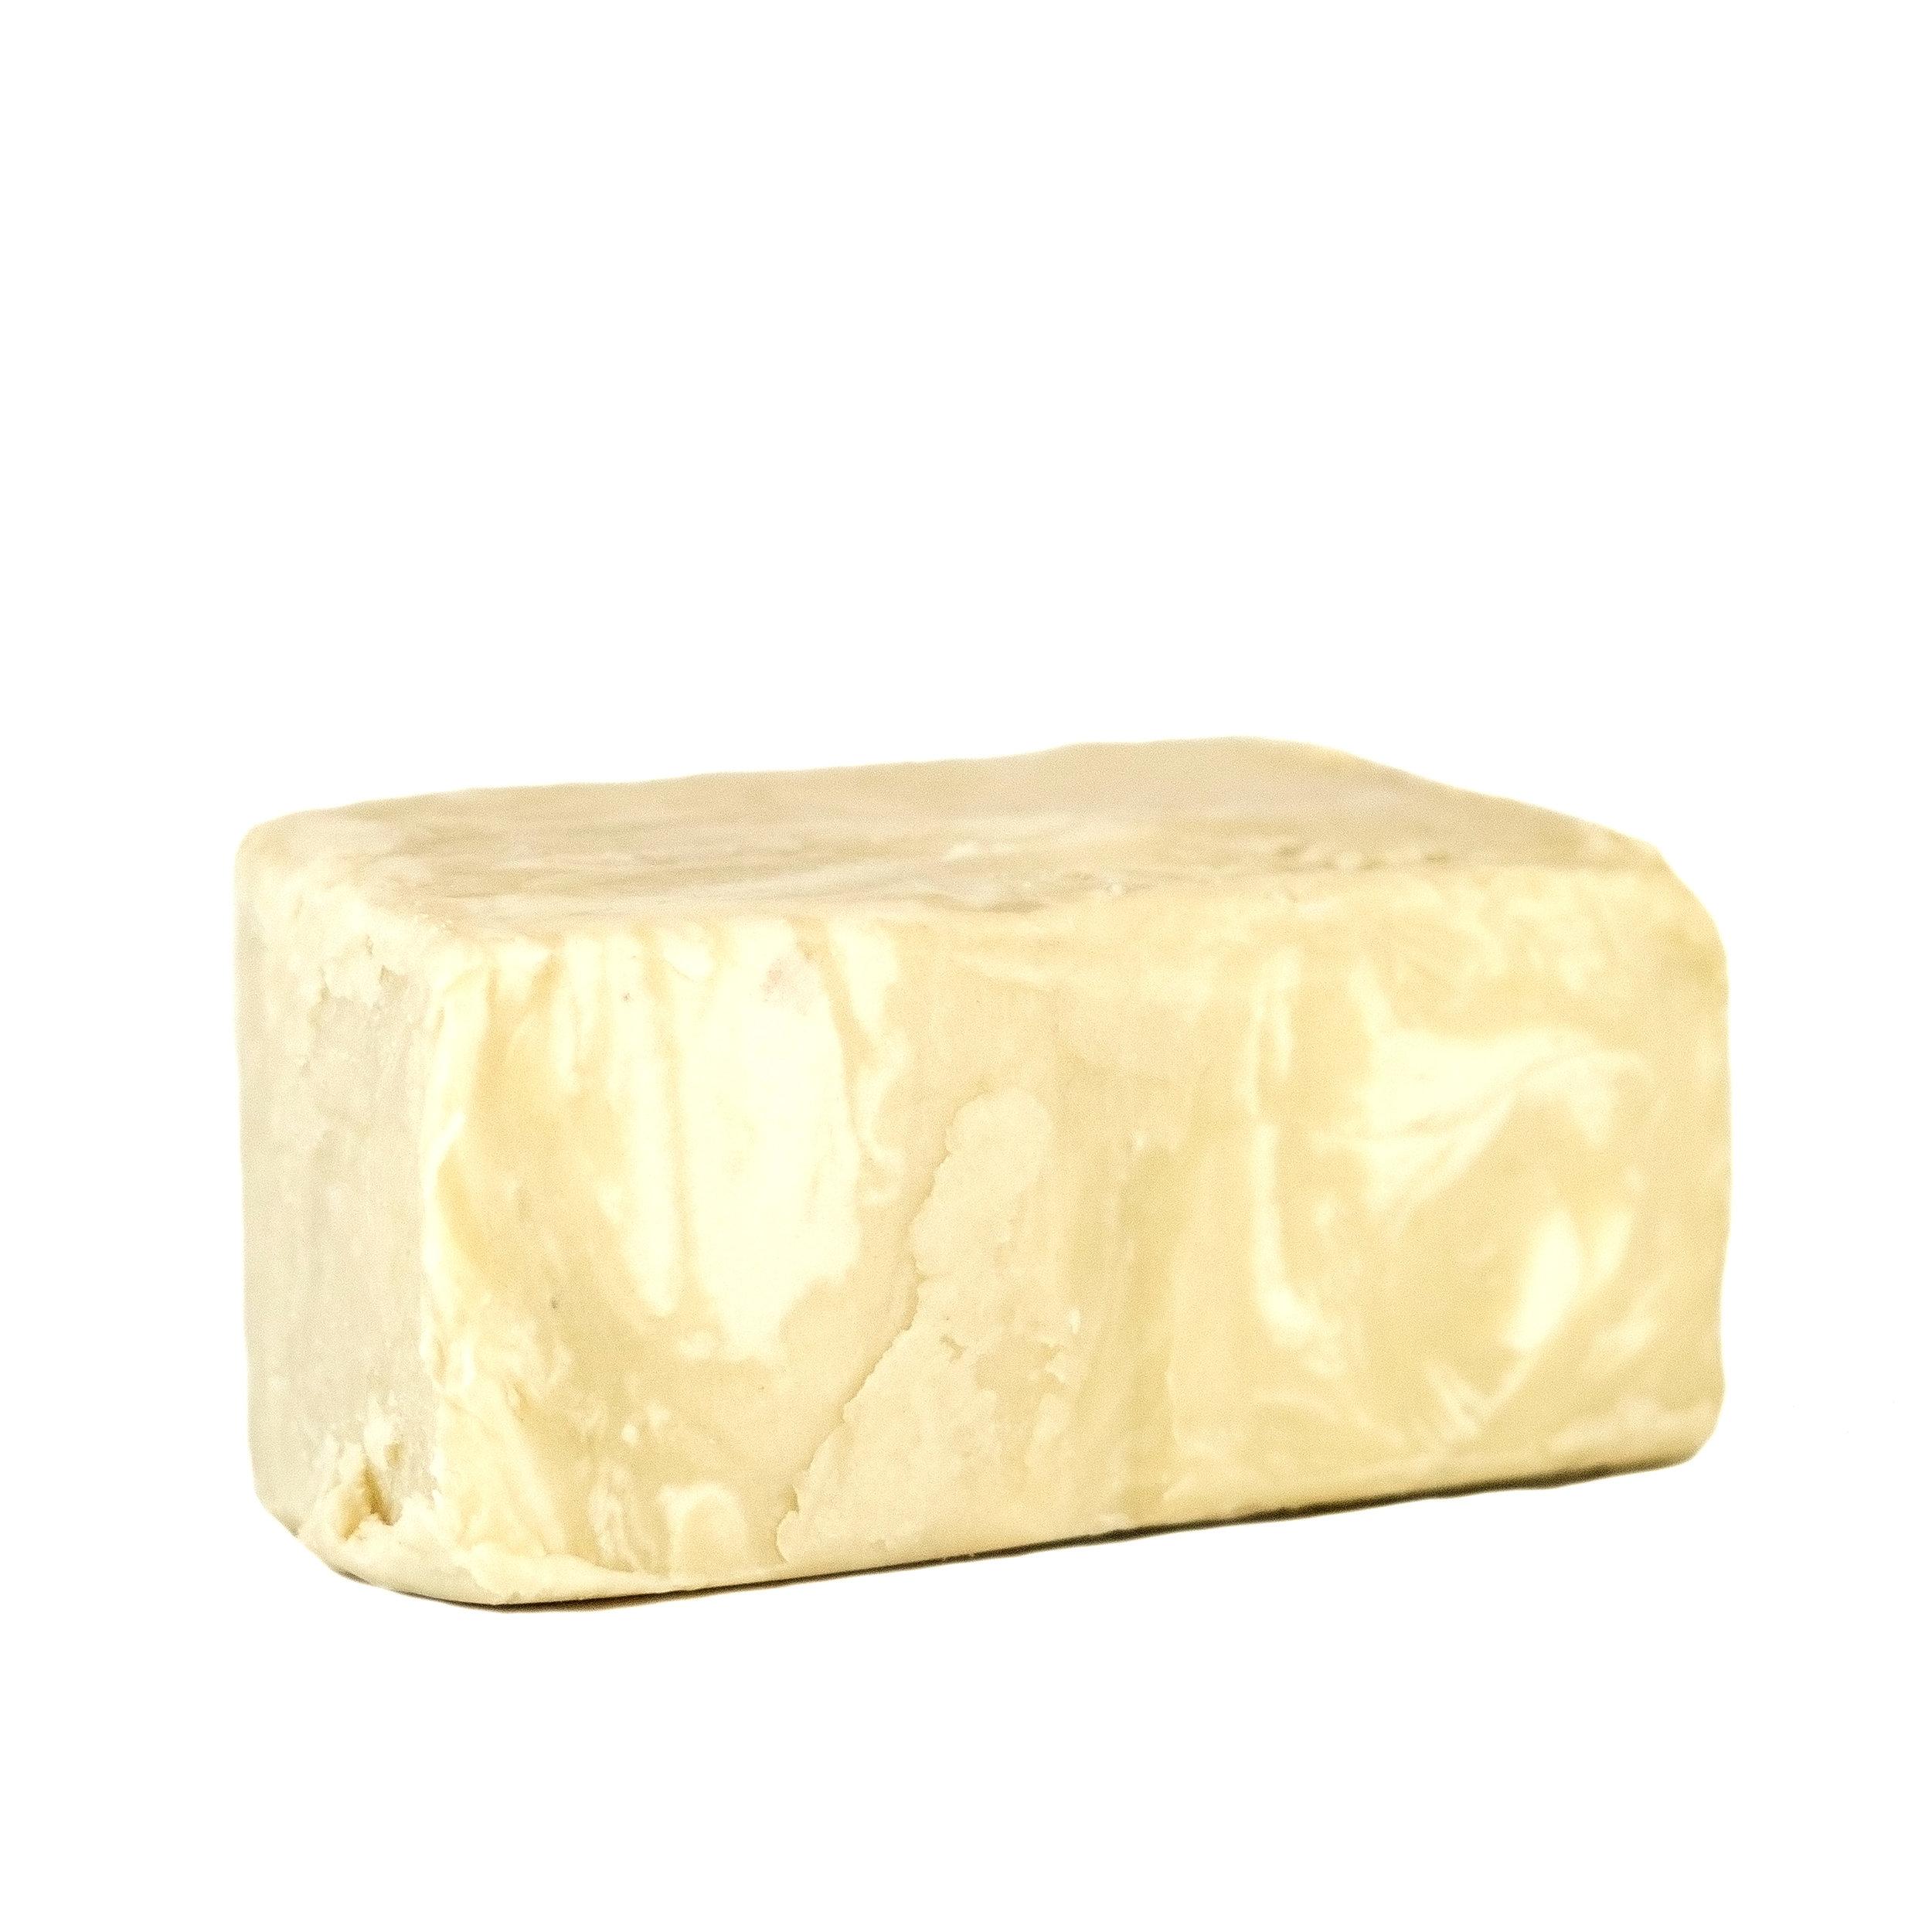 Shea Butter Product Photo